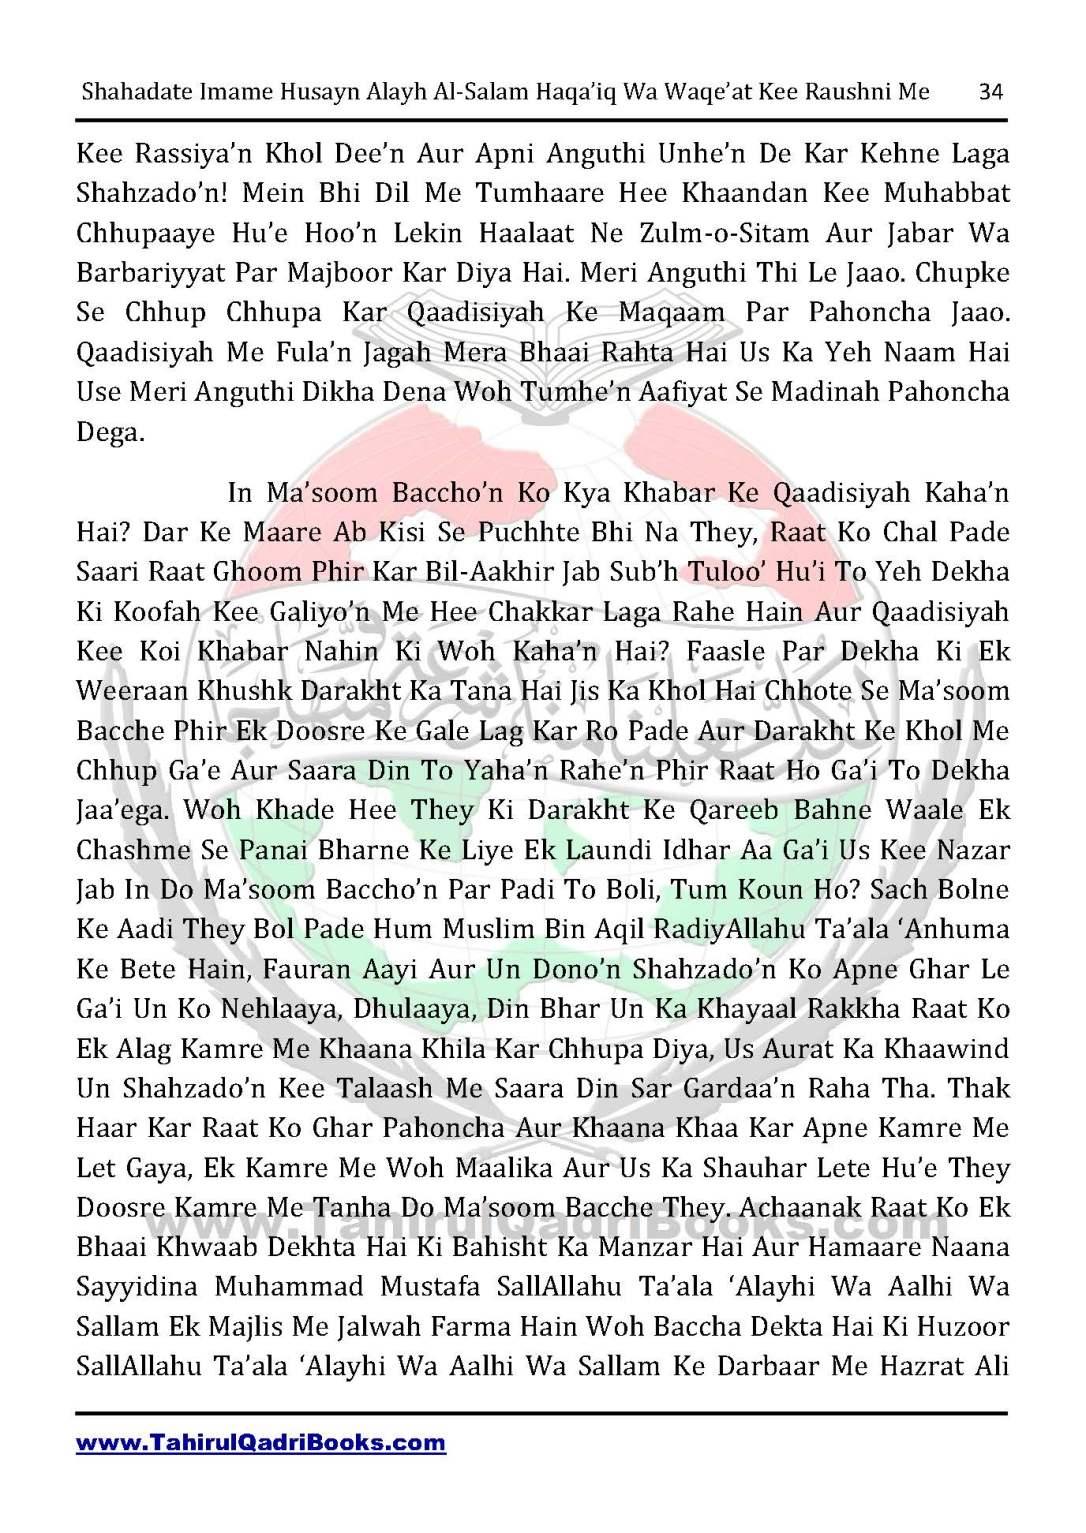 shahadate-imame-husayn-alayh-is-salam-haqaiq-wa-waqe_at-kee-raushni-me-in-roman-urdu-unlocked_Page_34